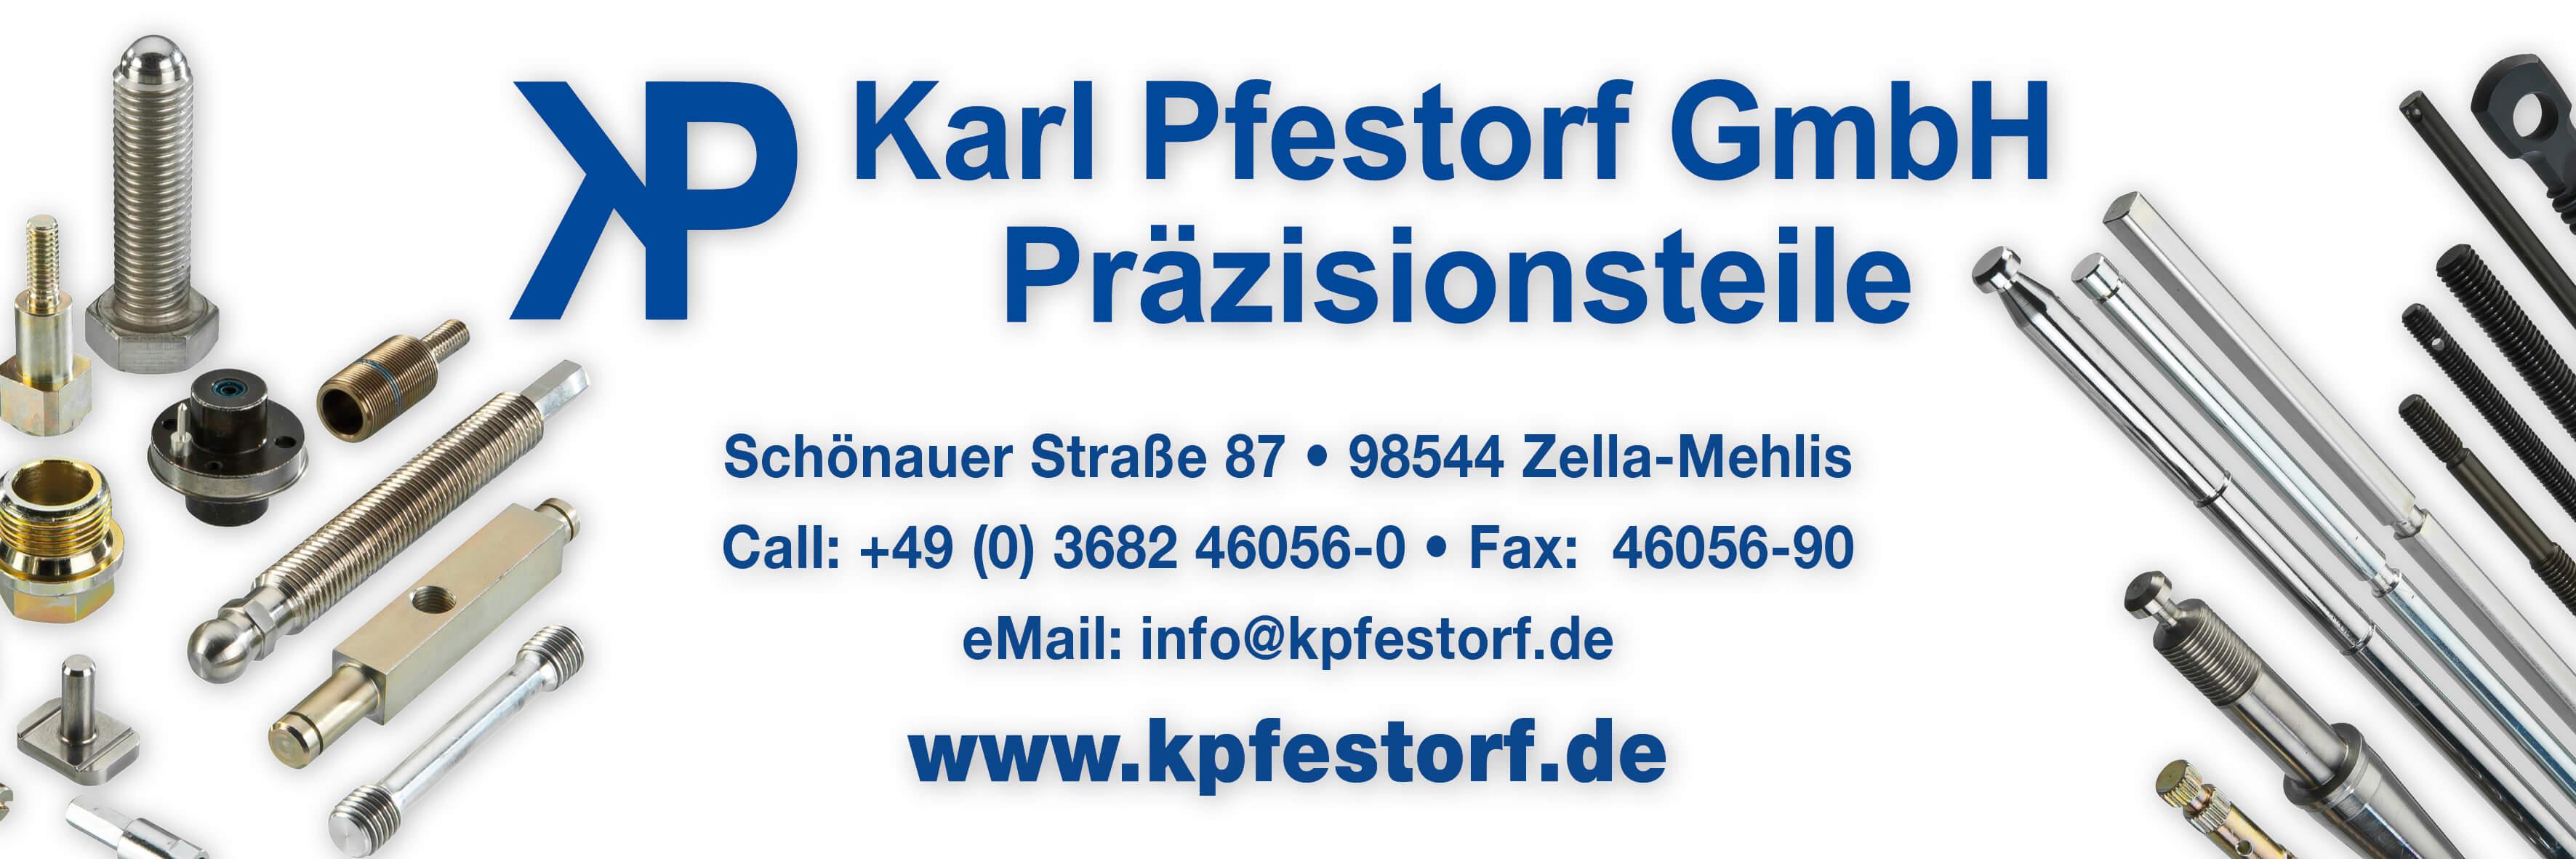 bandenwerbung_pfestorf_3000x1000_v3(1)